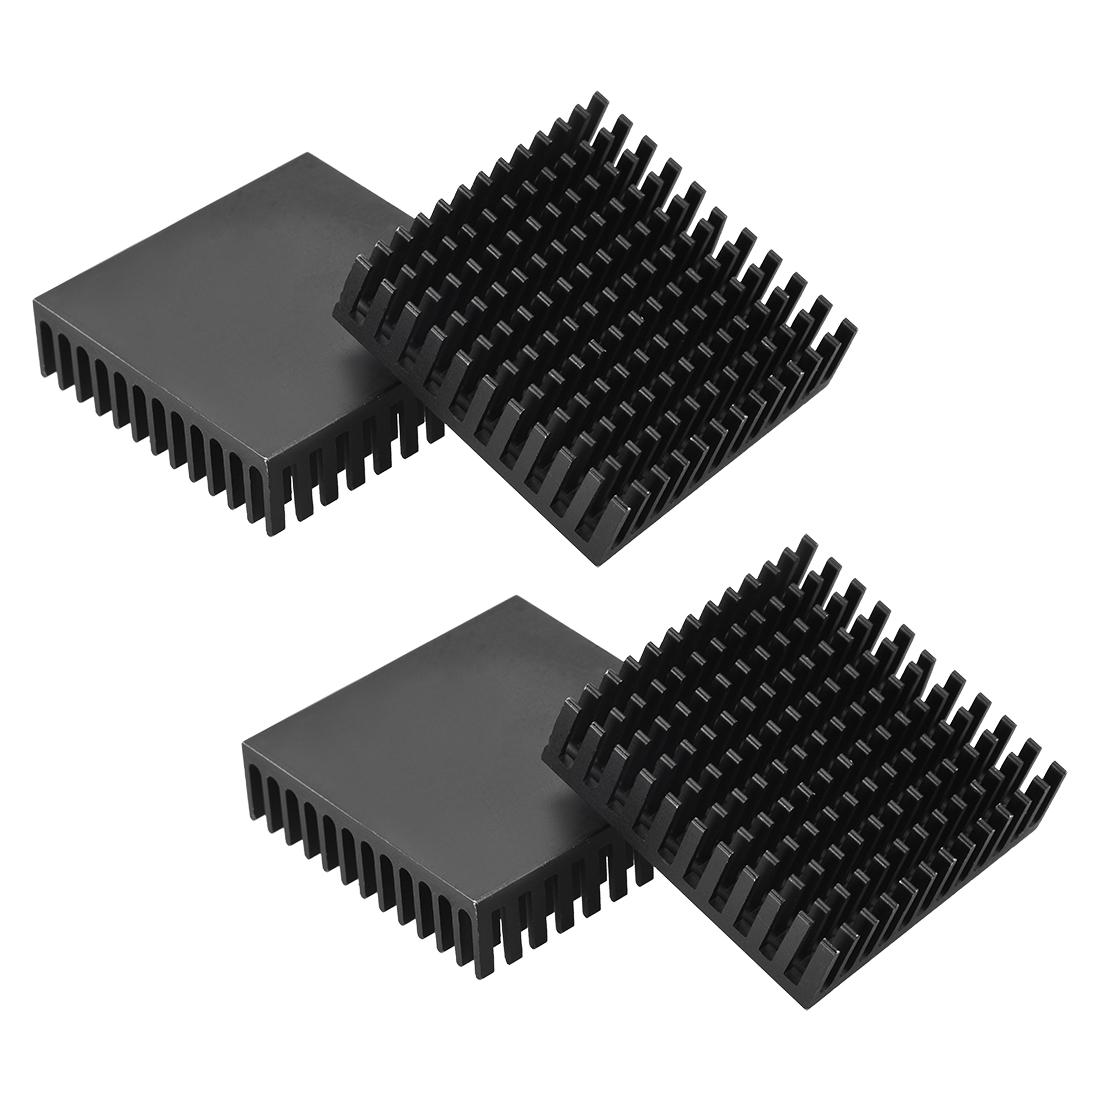 Heatsink for Cooling 3D Printers Cooler Heat Sink 40 x 40 x 11mm 4pcs